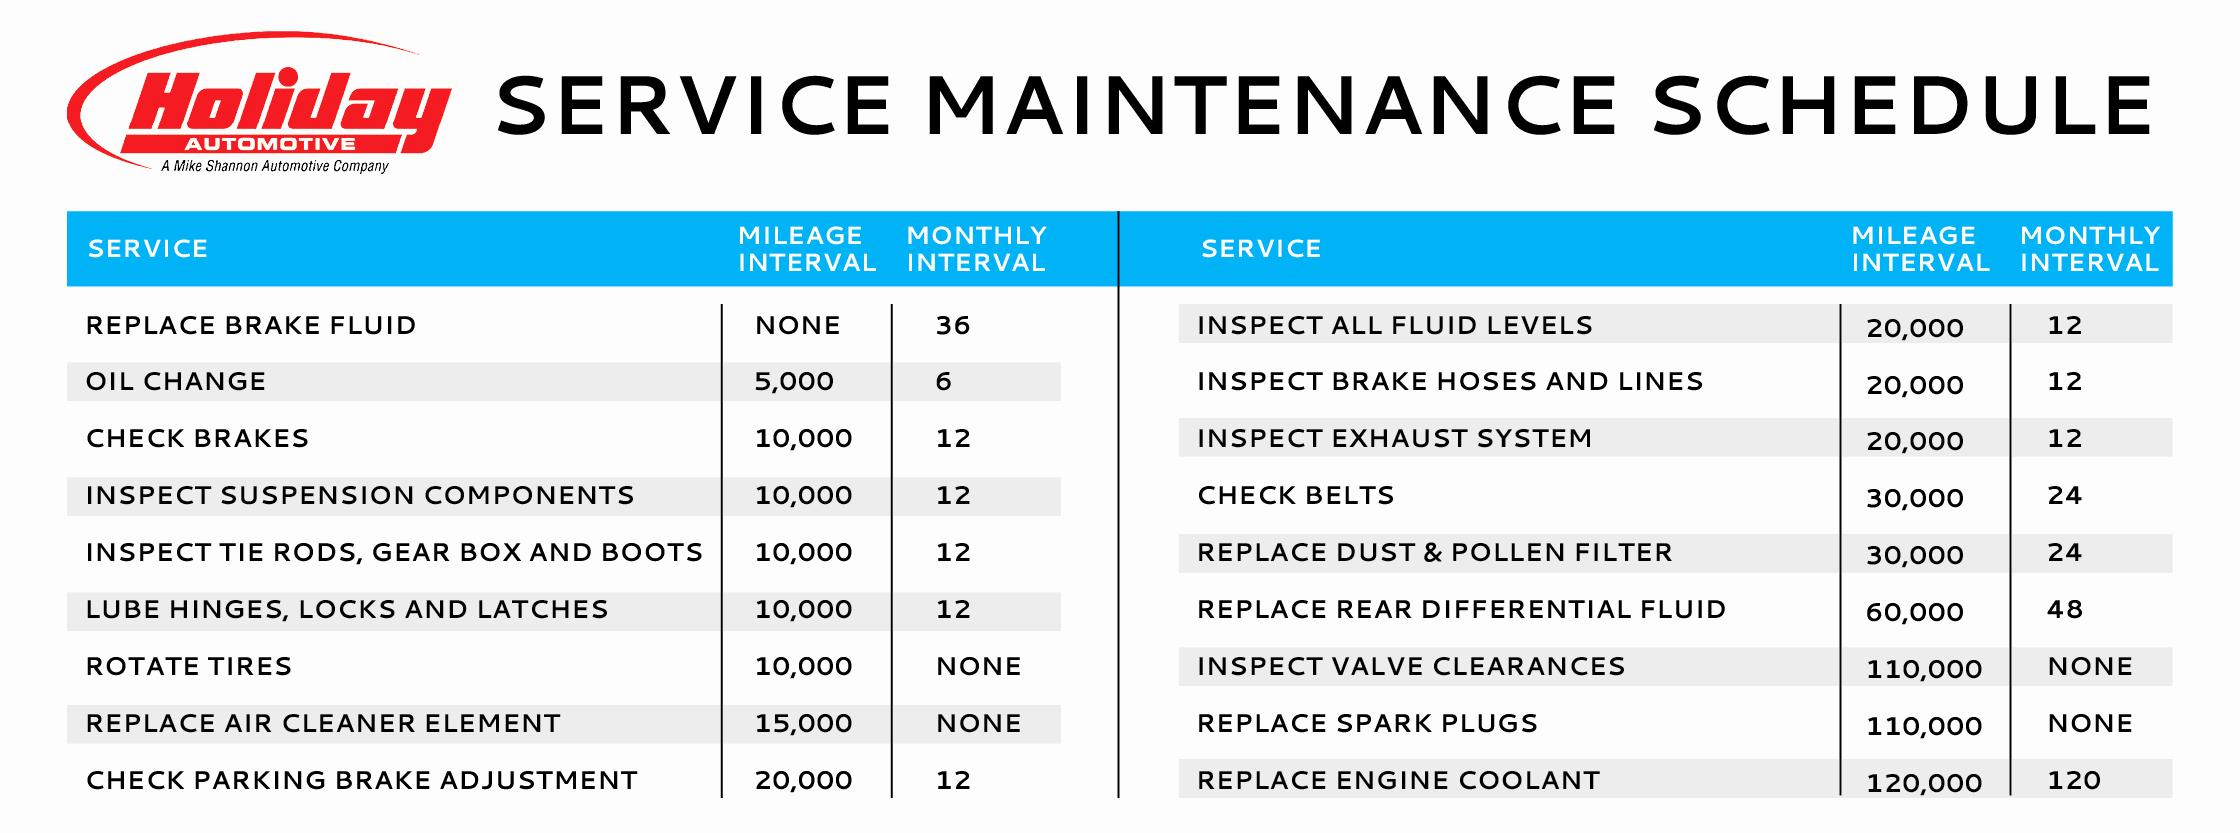 Car Maintenance Schedule Template Best Of Maintenance Schedule 0516 D Holiday Automotive